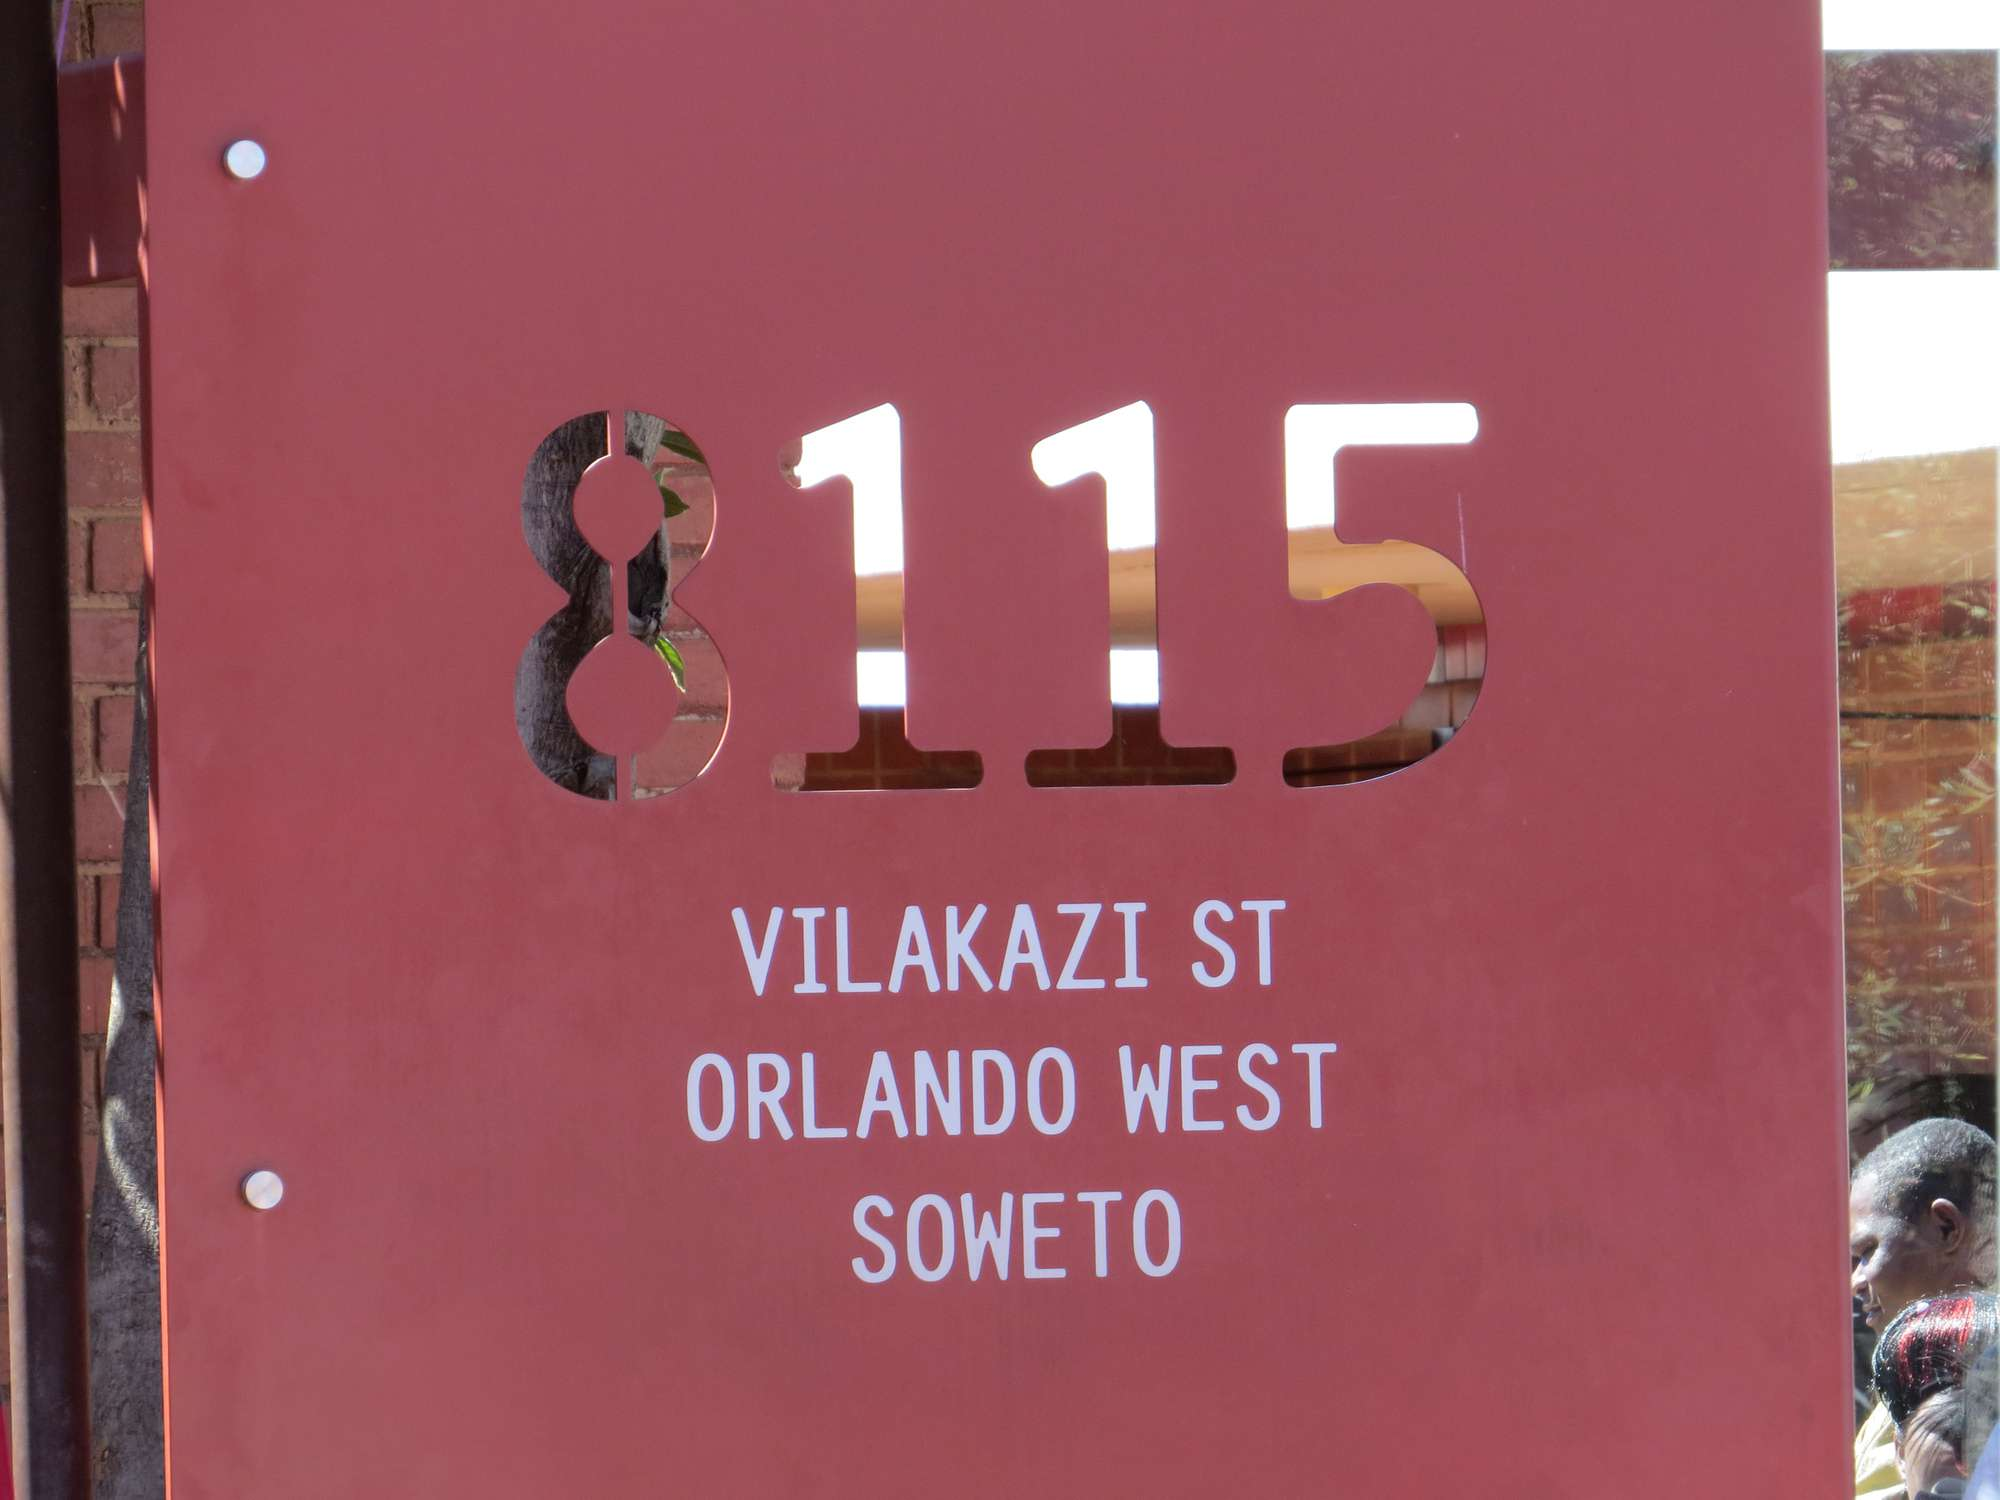 Sign outside Nelson Mandela's house on Vilakazi Street, Soweto